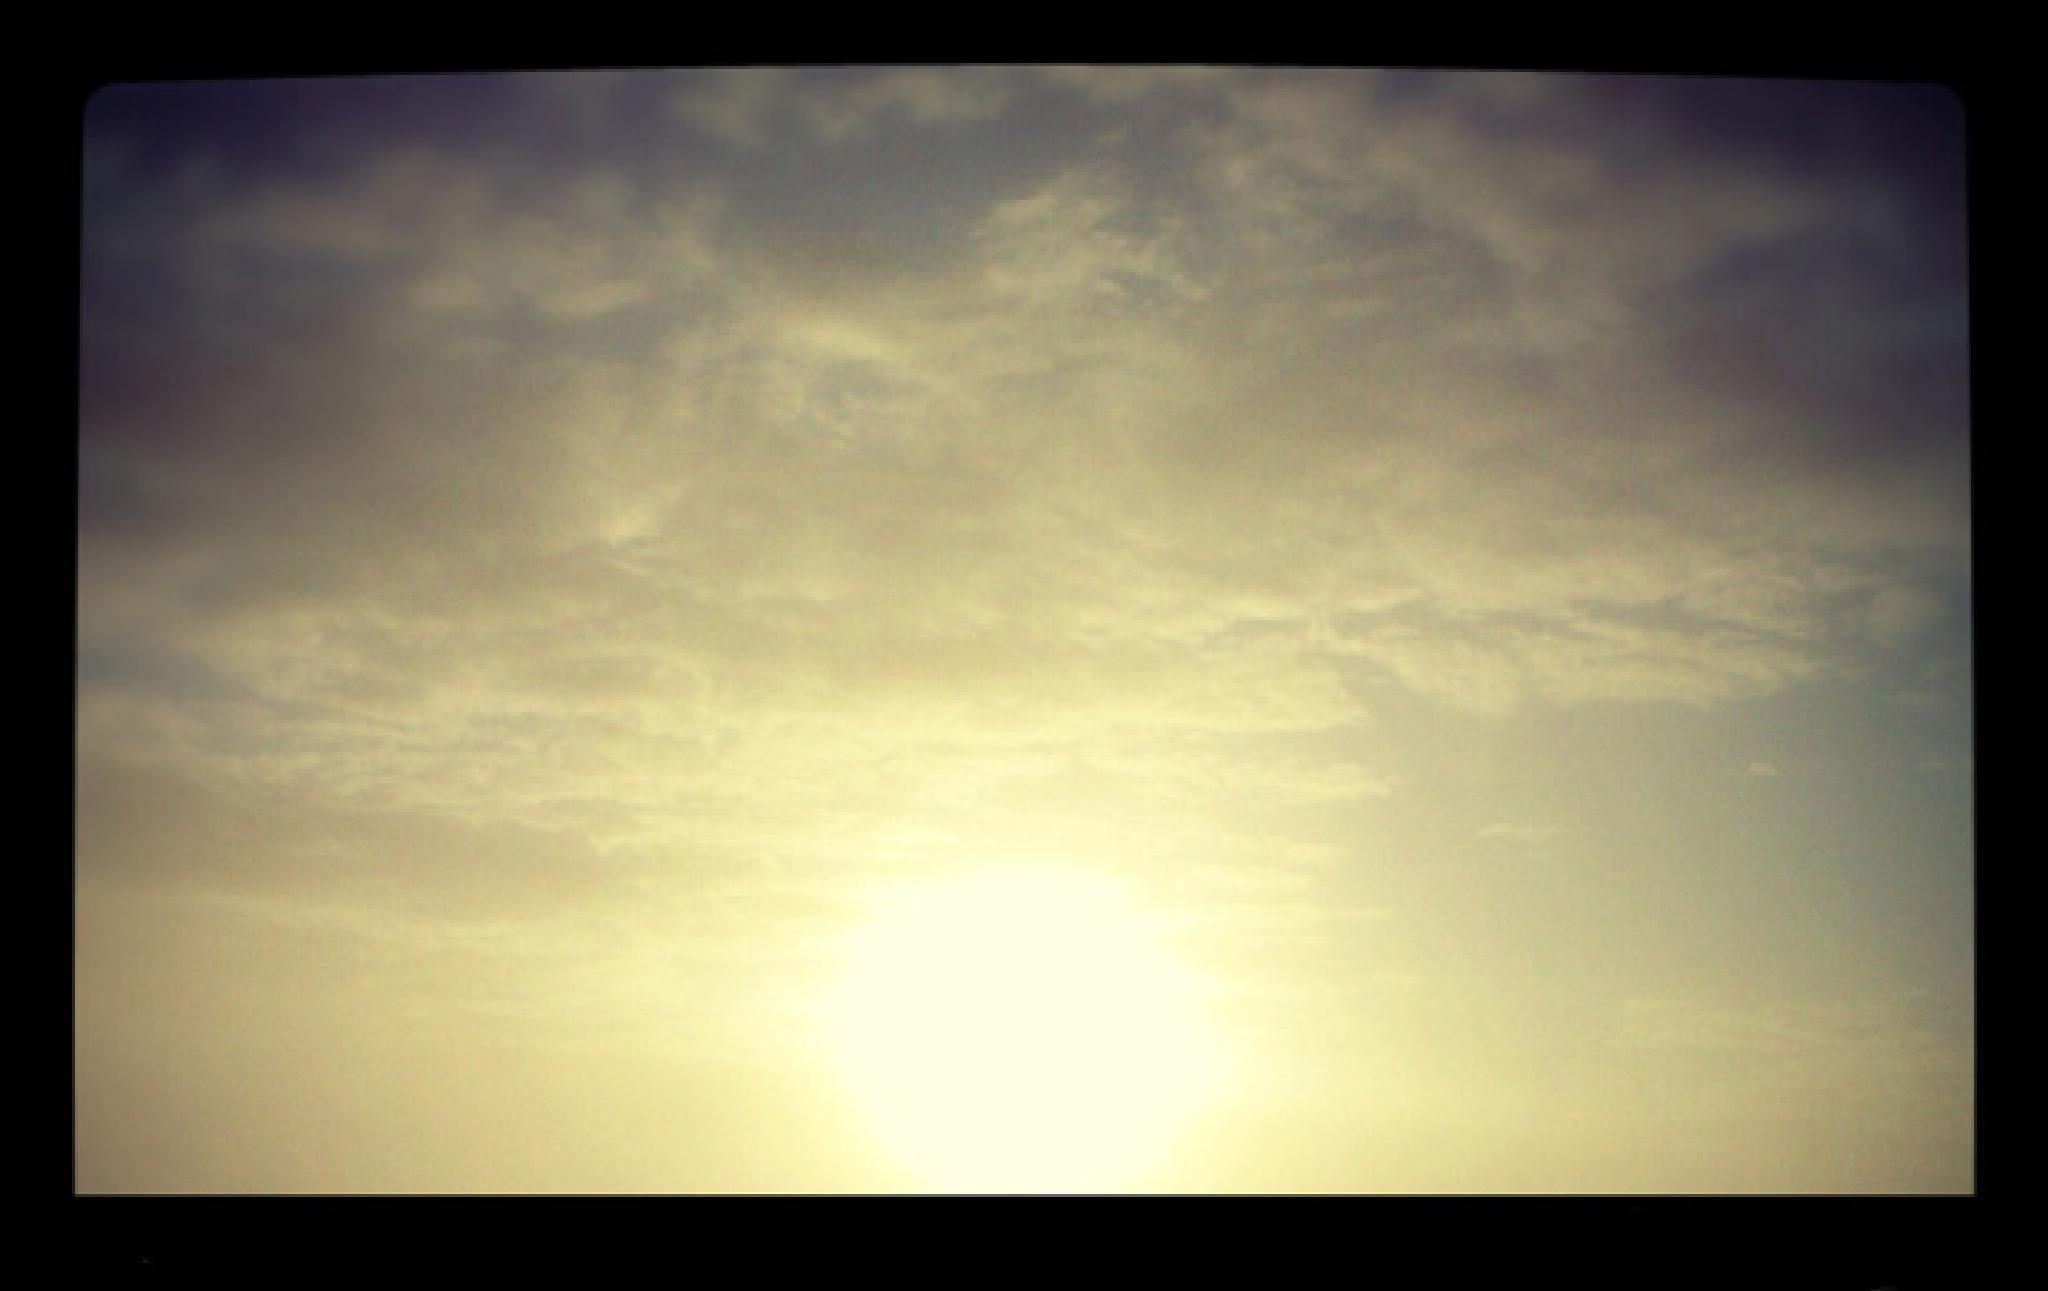 Morning sky by Eijav